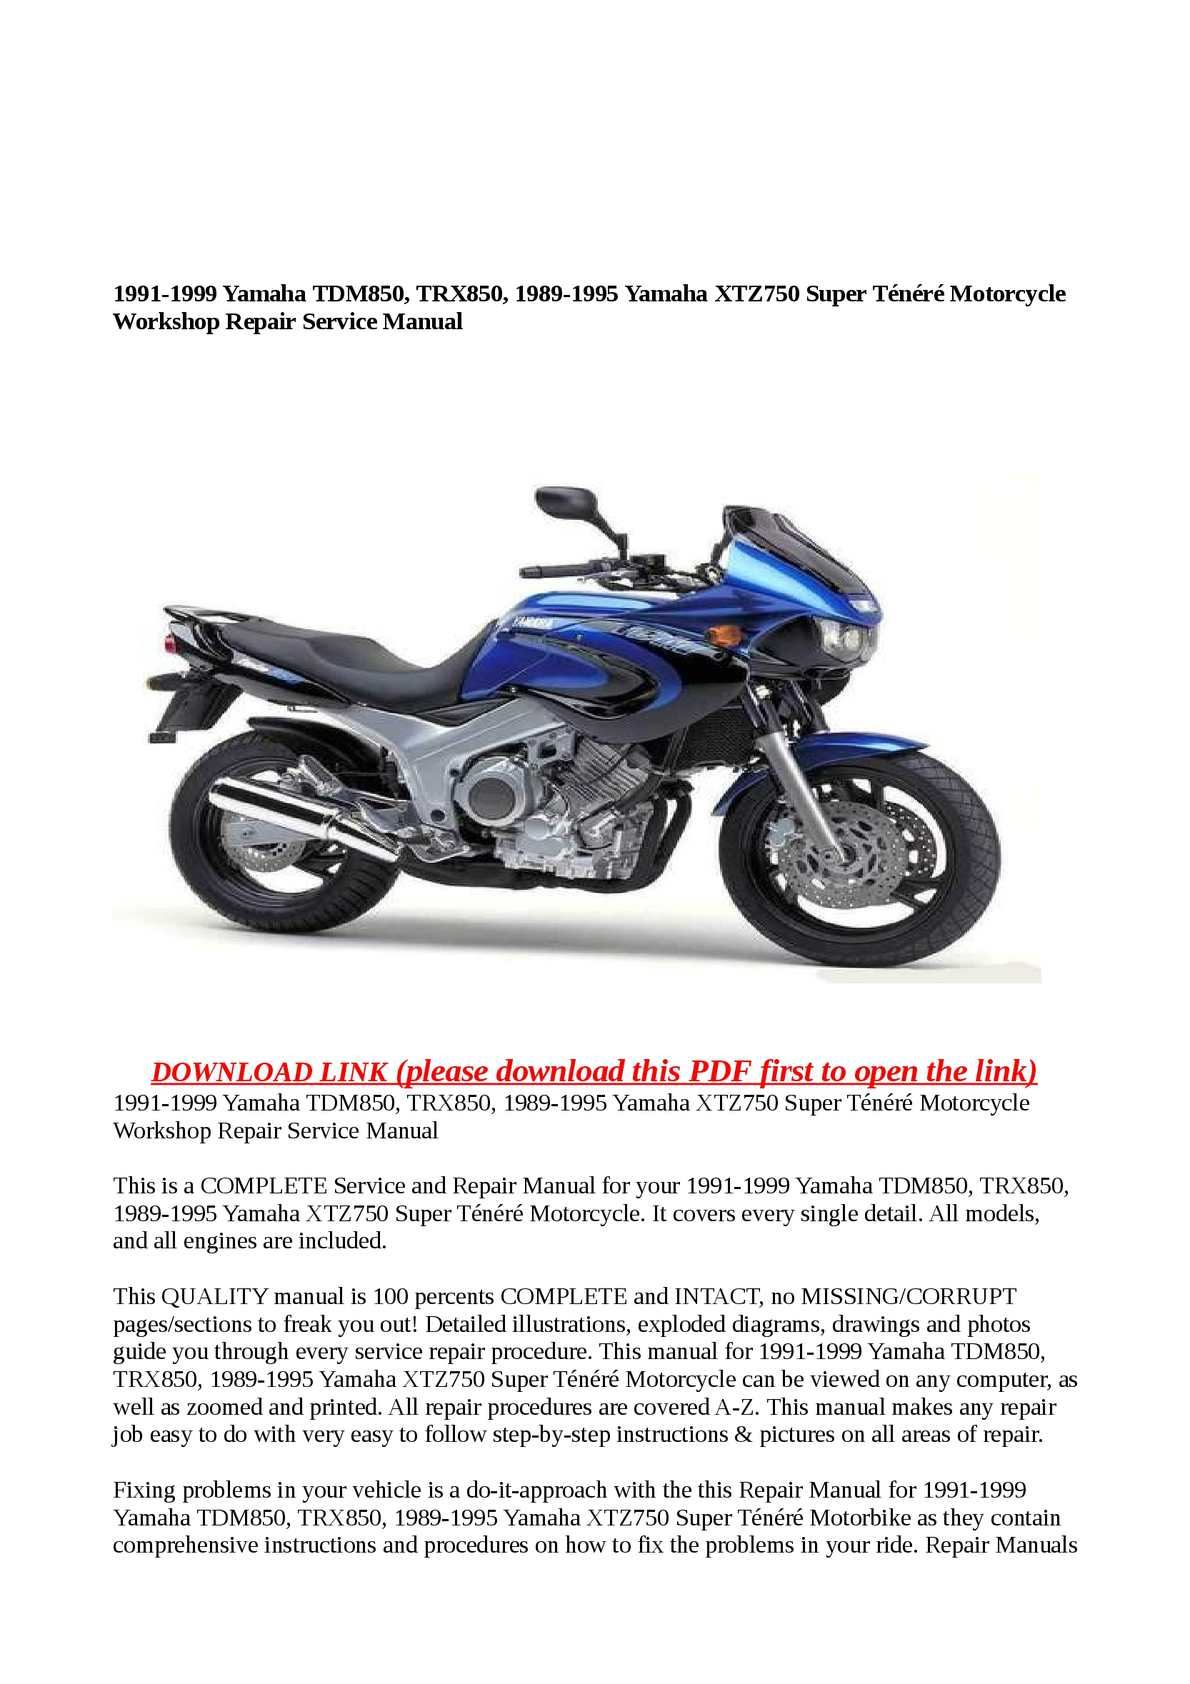 download now yamaha ew50 ew 50 slider 00 02 service repair workshop manual